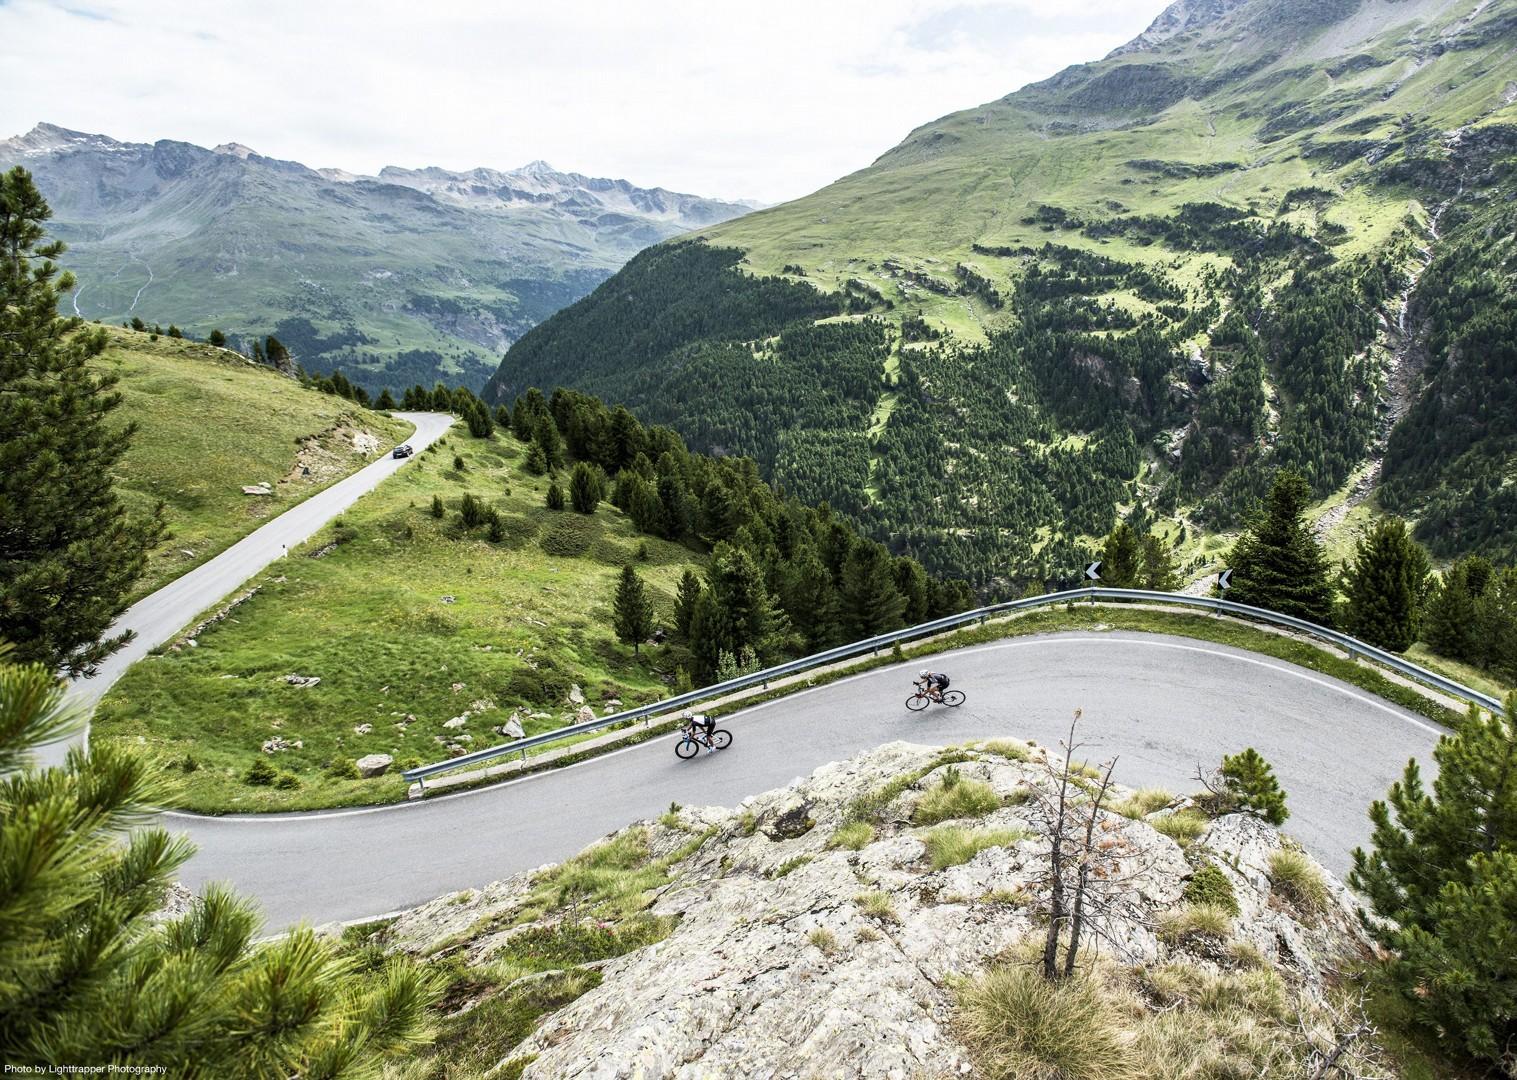 bergamo-guided-road-cycling-holiday.jpg - Italy - Italian Alps Introduction - Guided Road Cycling Holiday - Italia Road Cycling